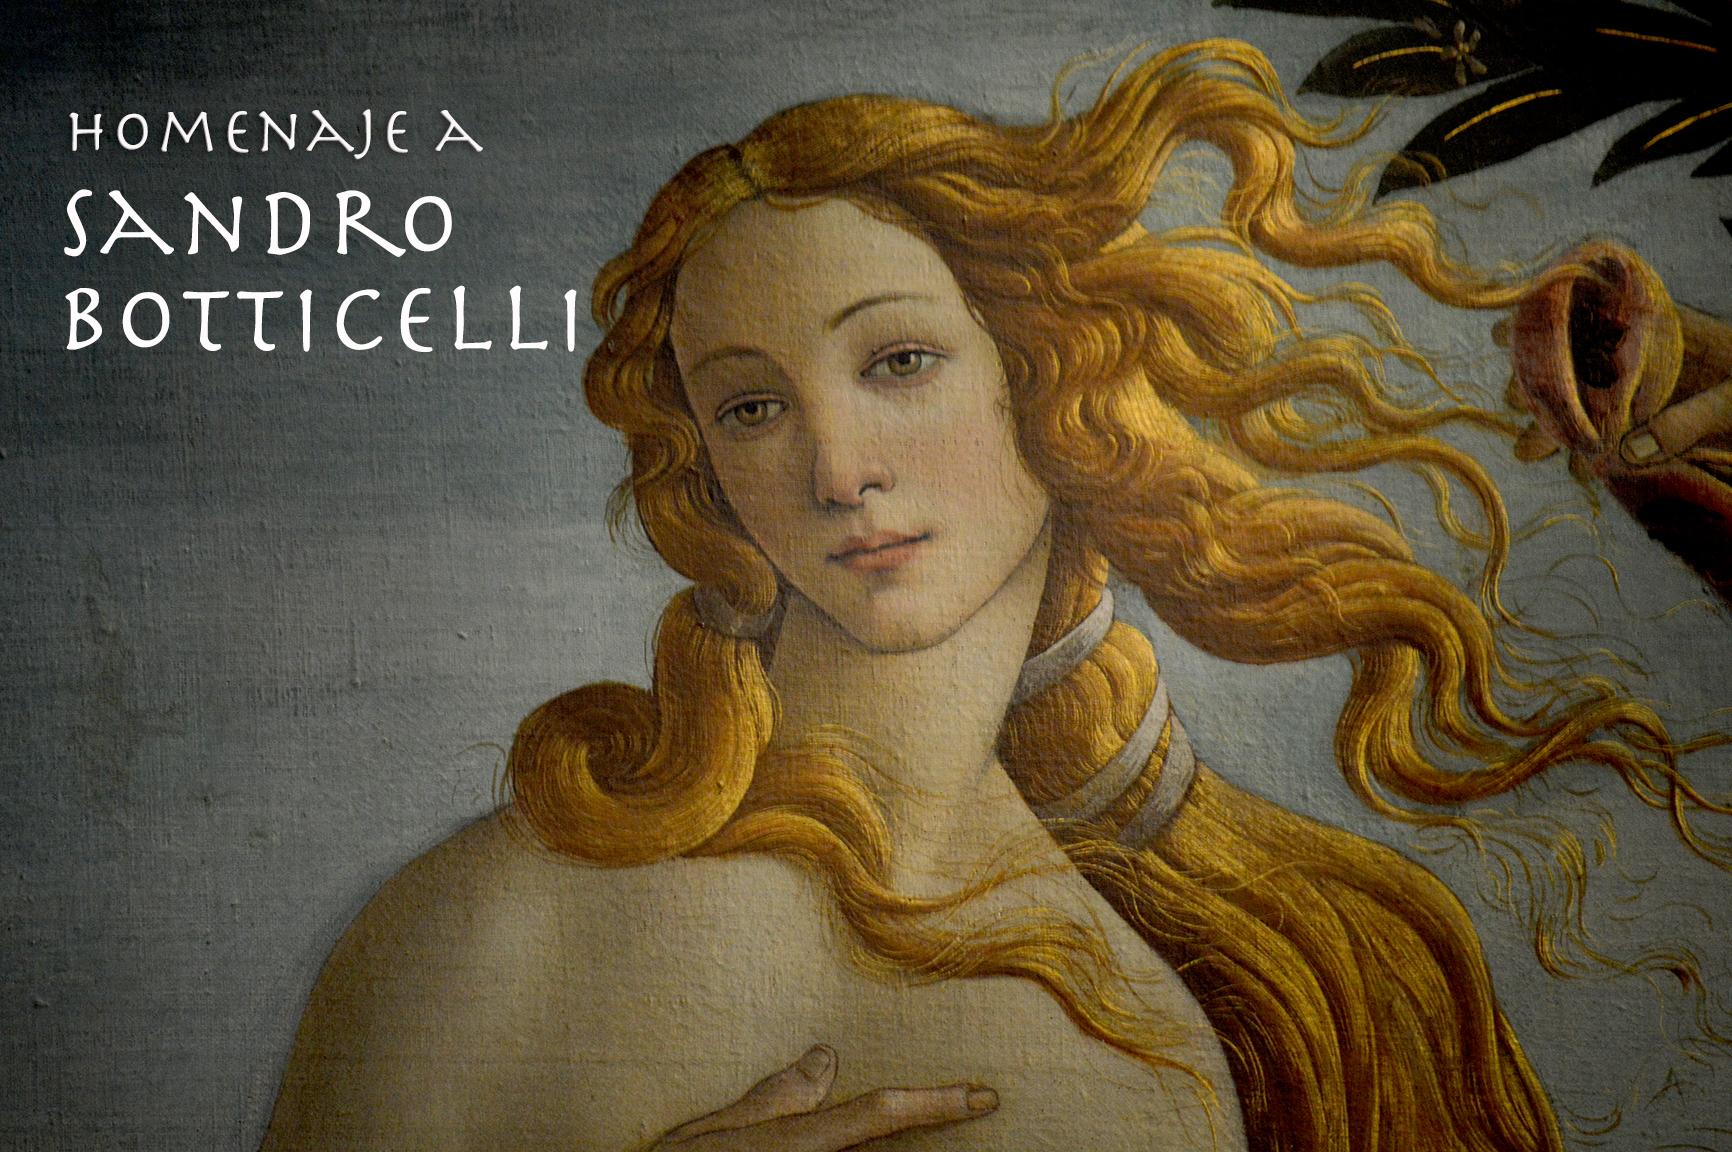 Homenaje a Sandro Botticelli